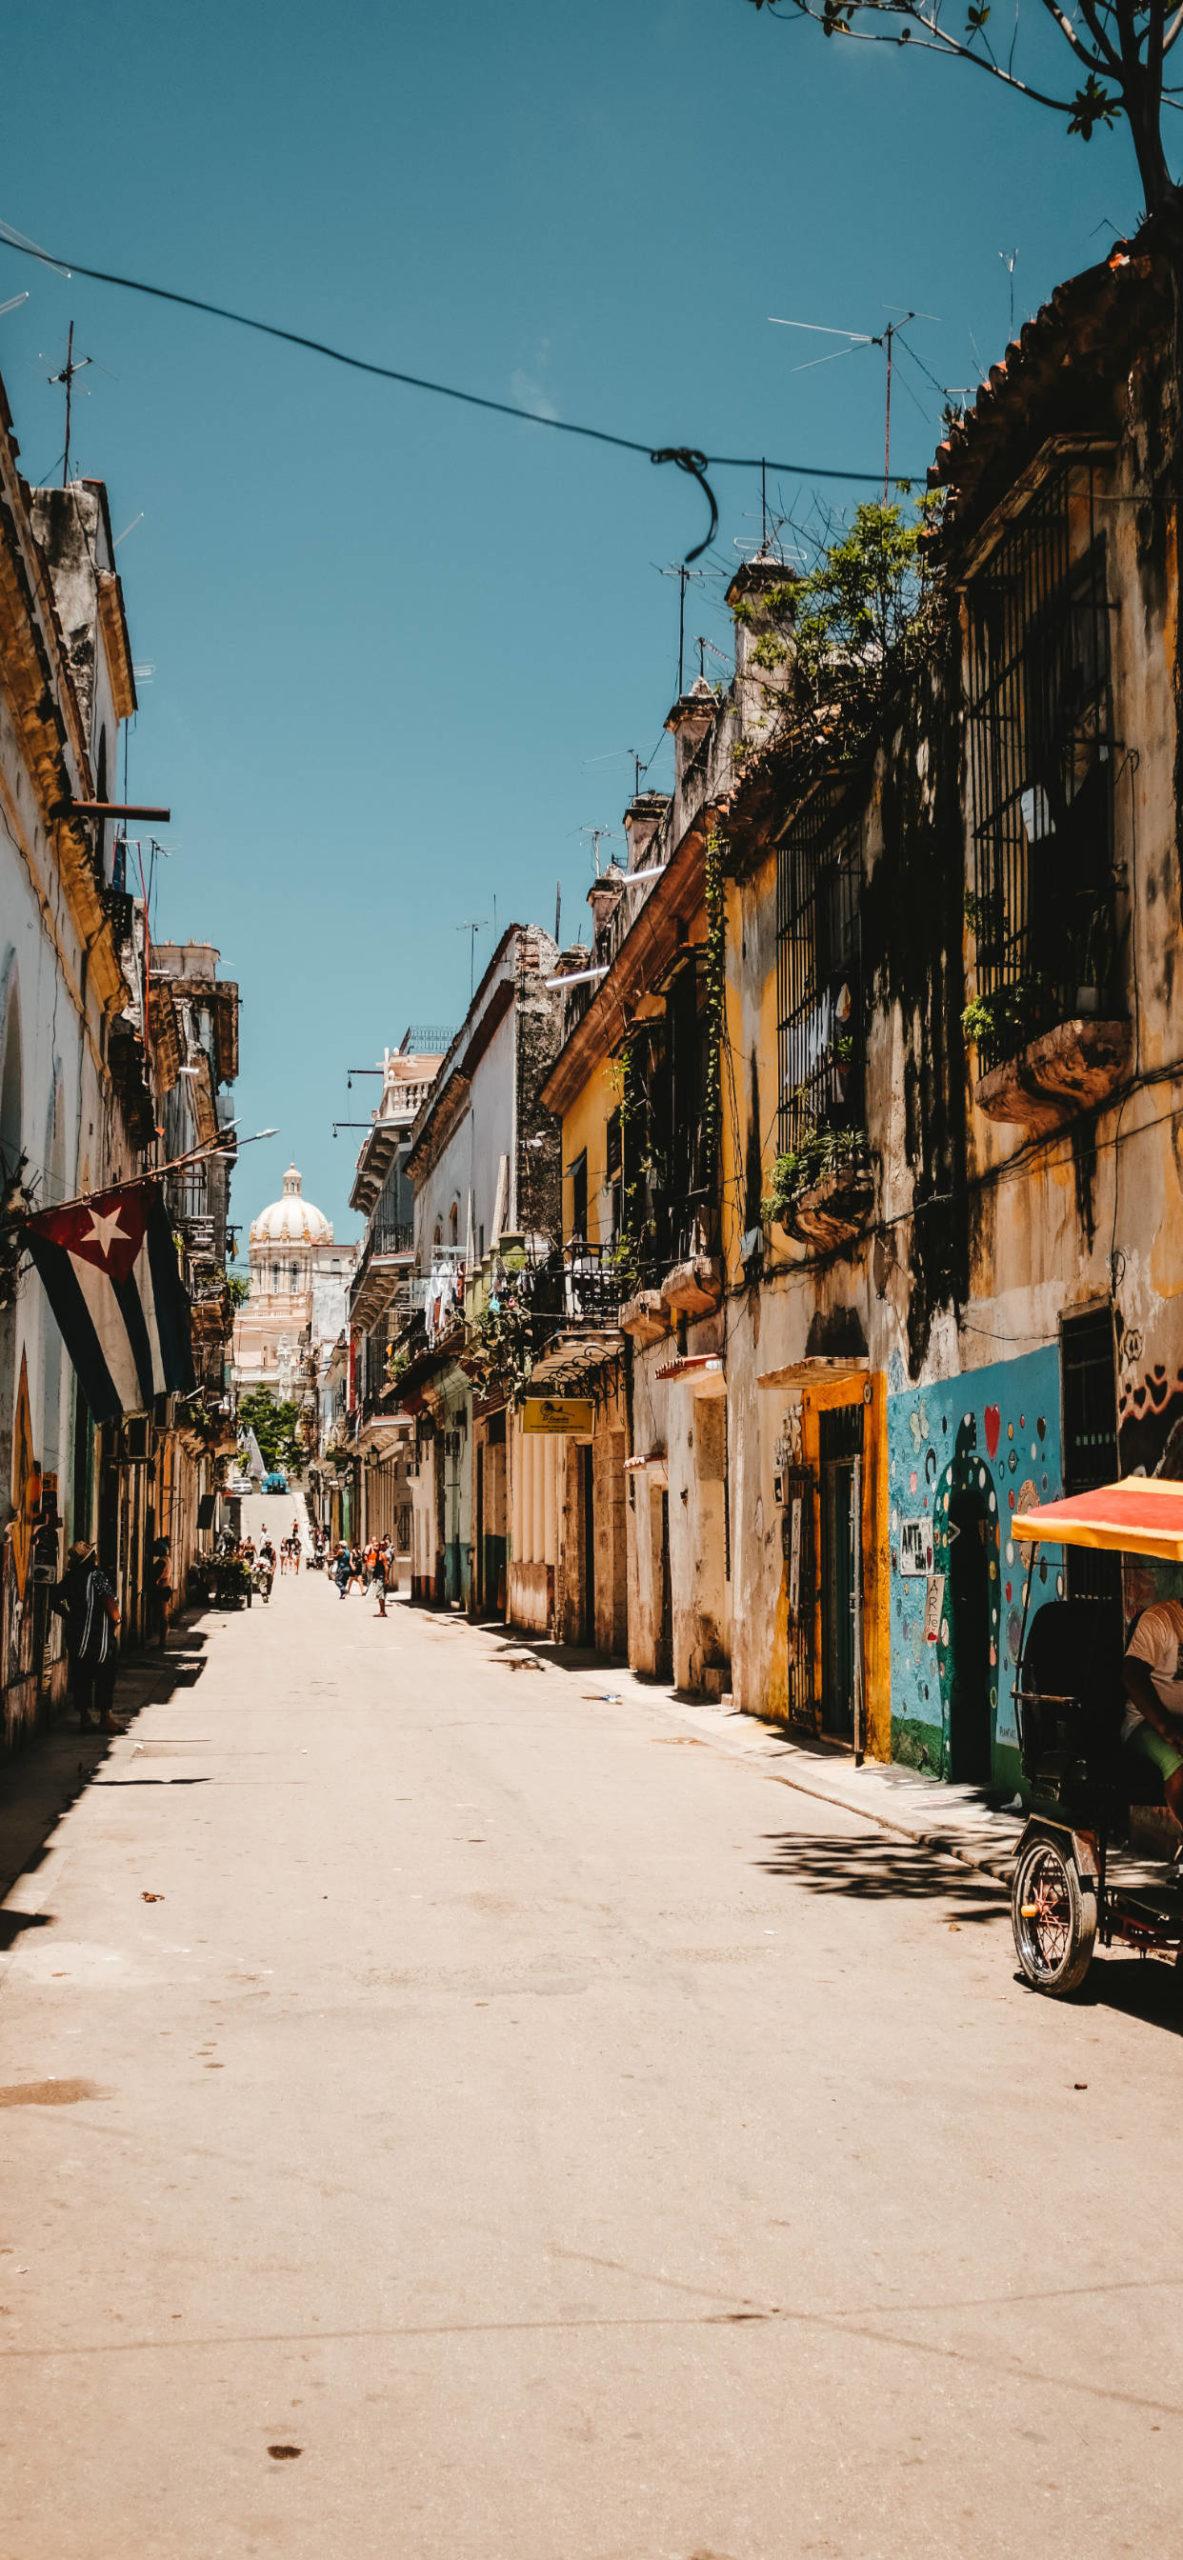 iPhone wallpapers cuba street flag scaled Cuba